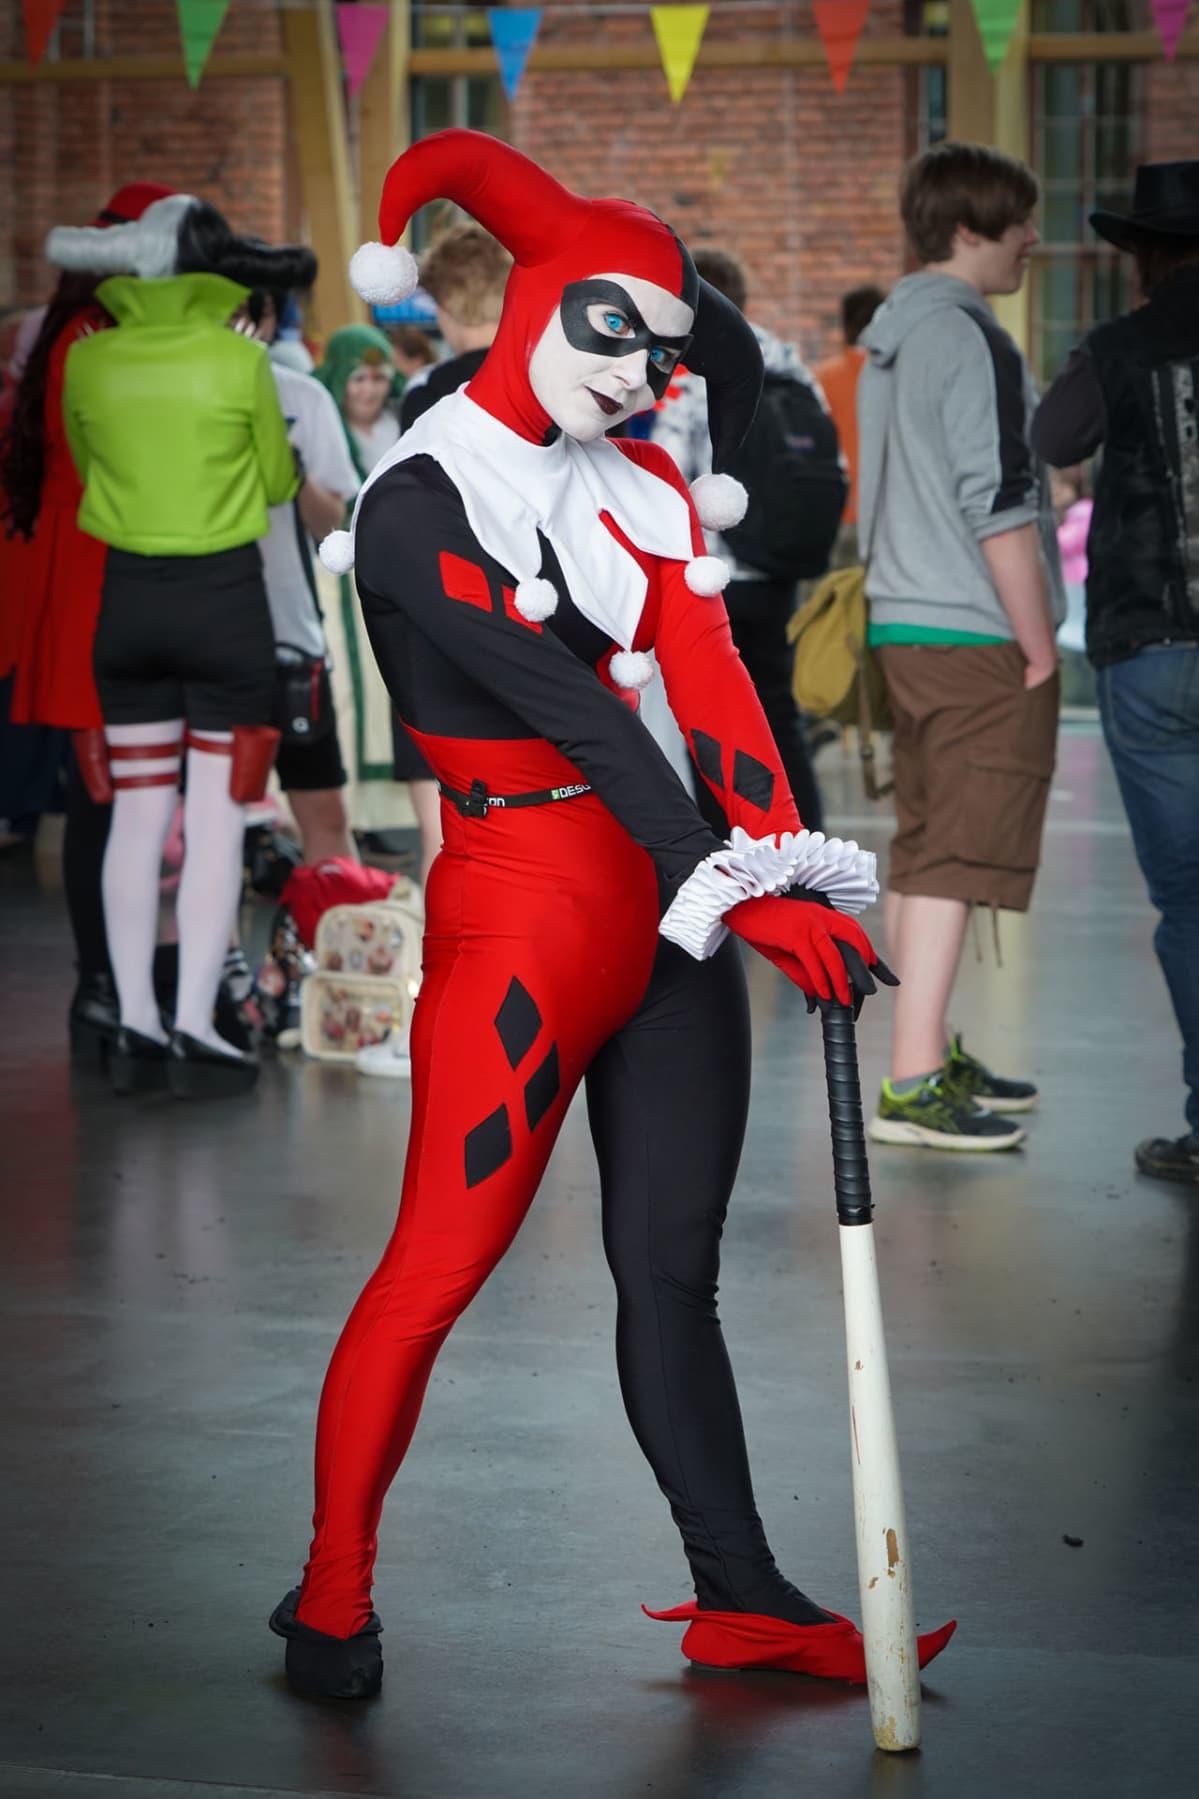 Desucon, anime, Harley Quinn, Batman